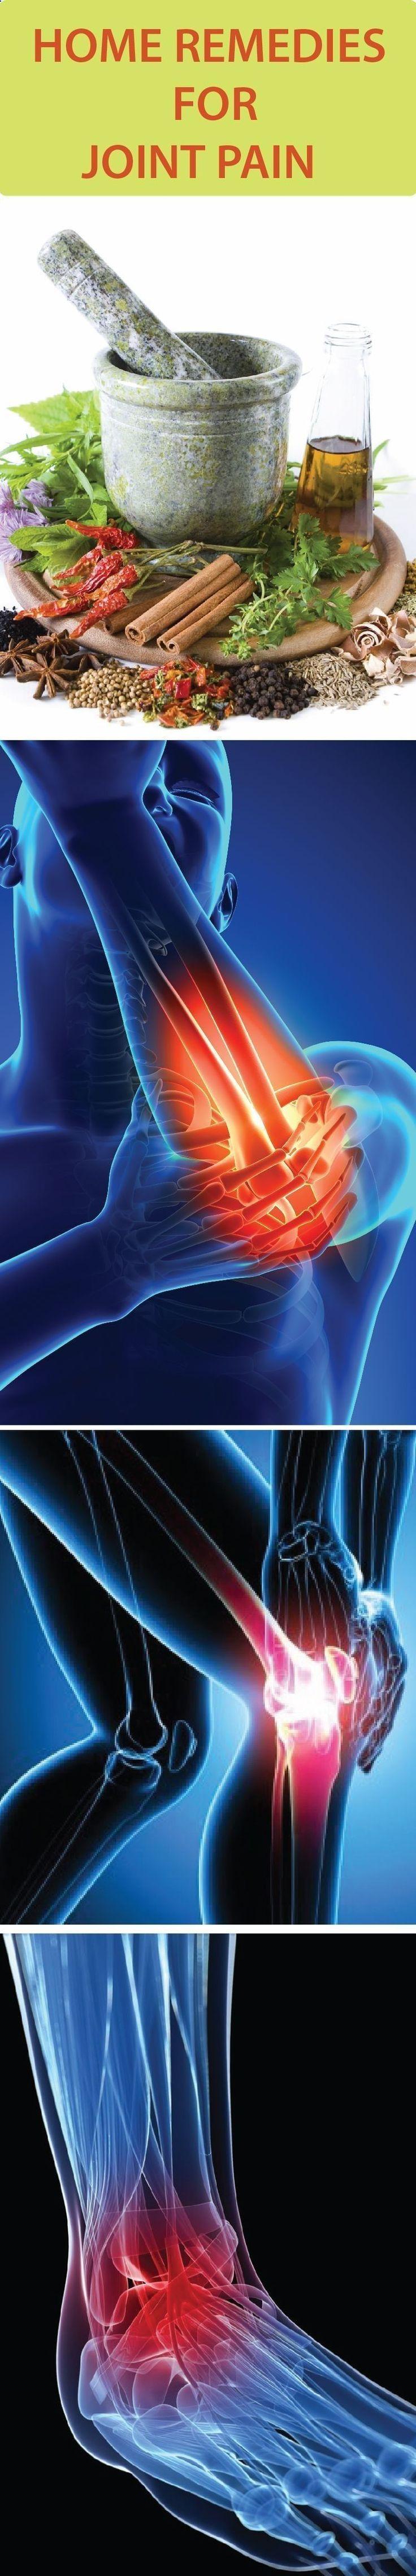 Arthritis Remedies Hands Natural Cures - Arthritis Remedies Hands Natural Cures - Arthritis Remedies Hands Natural Cures - 12 Natural Arthritis Remedies You Have in Your Kitchen - Arthritis Remedies Hands Natural Cures - Arthritis Remedies Hands Natural Cures - Arthritis Remedies Hands Natural Cures